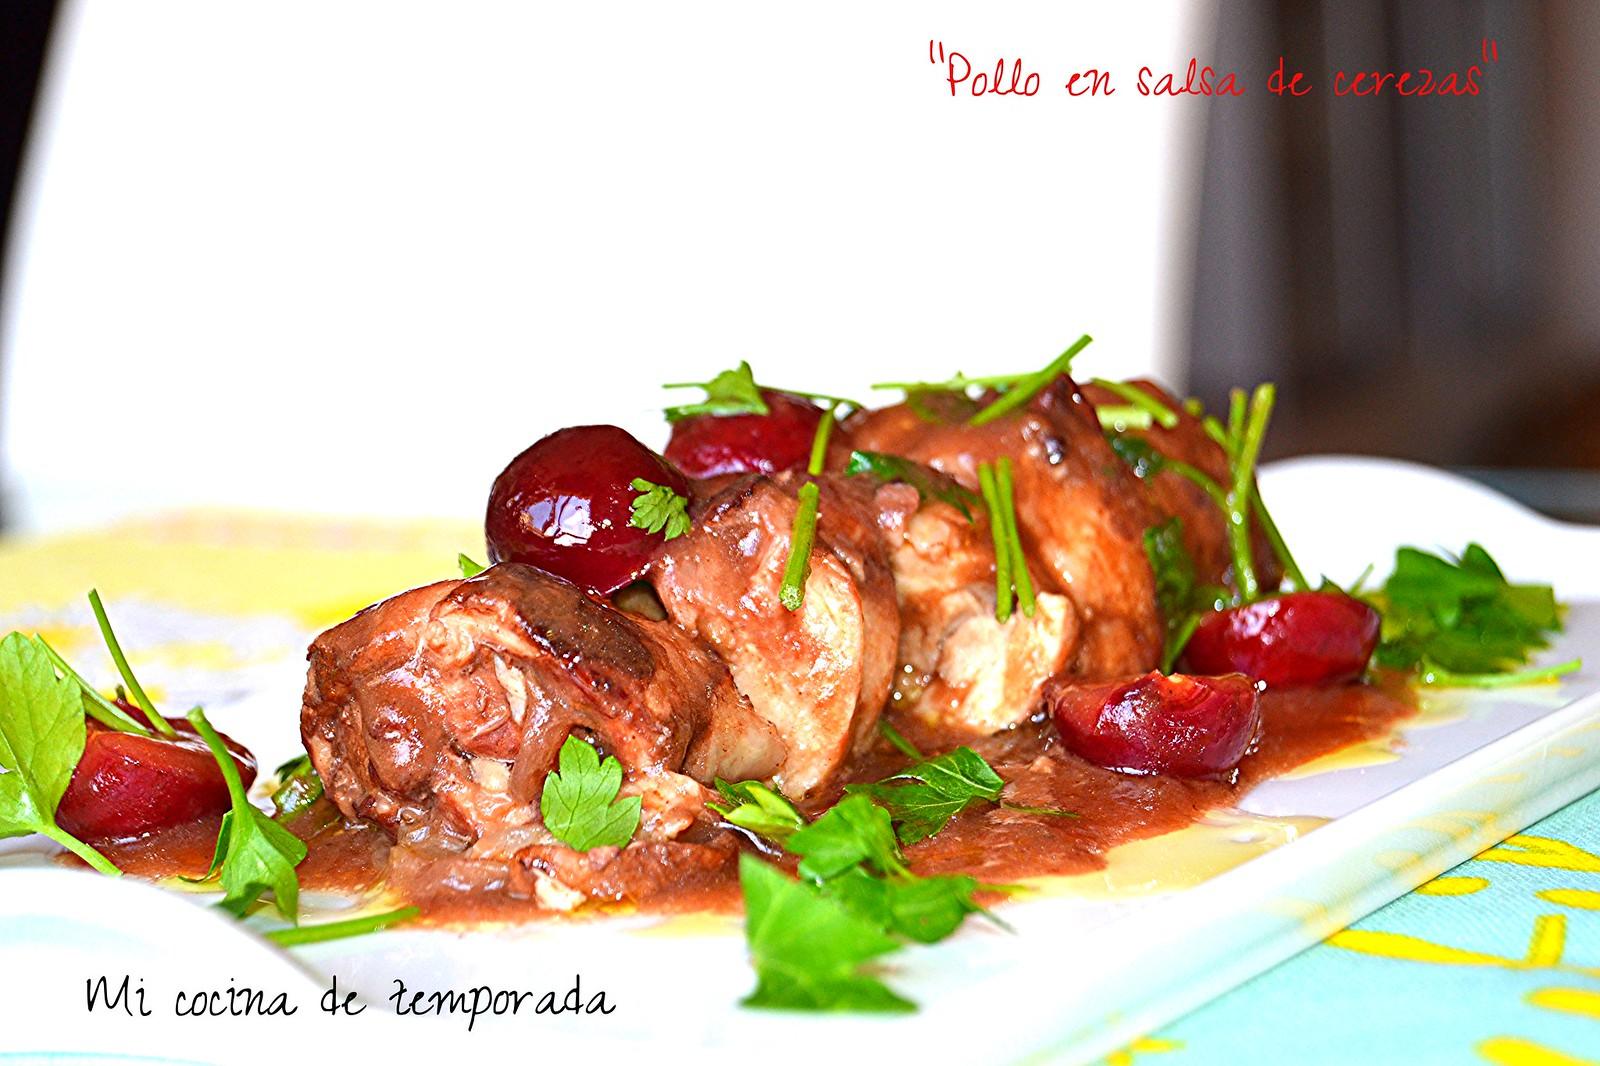 Pollo en salsa de cerezas 006